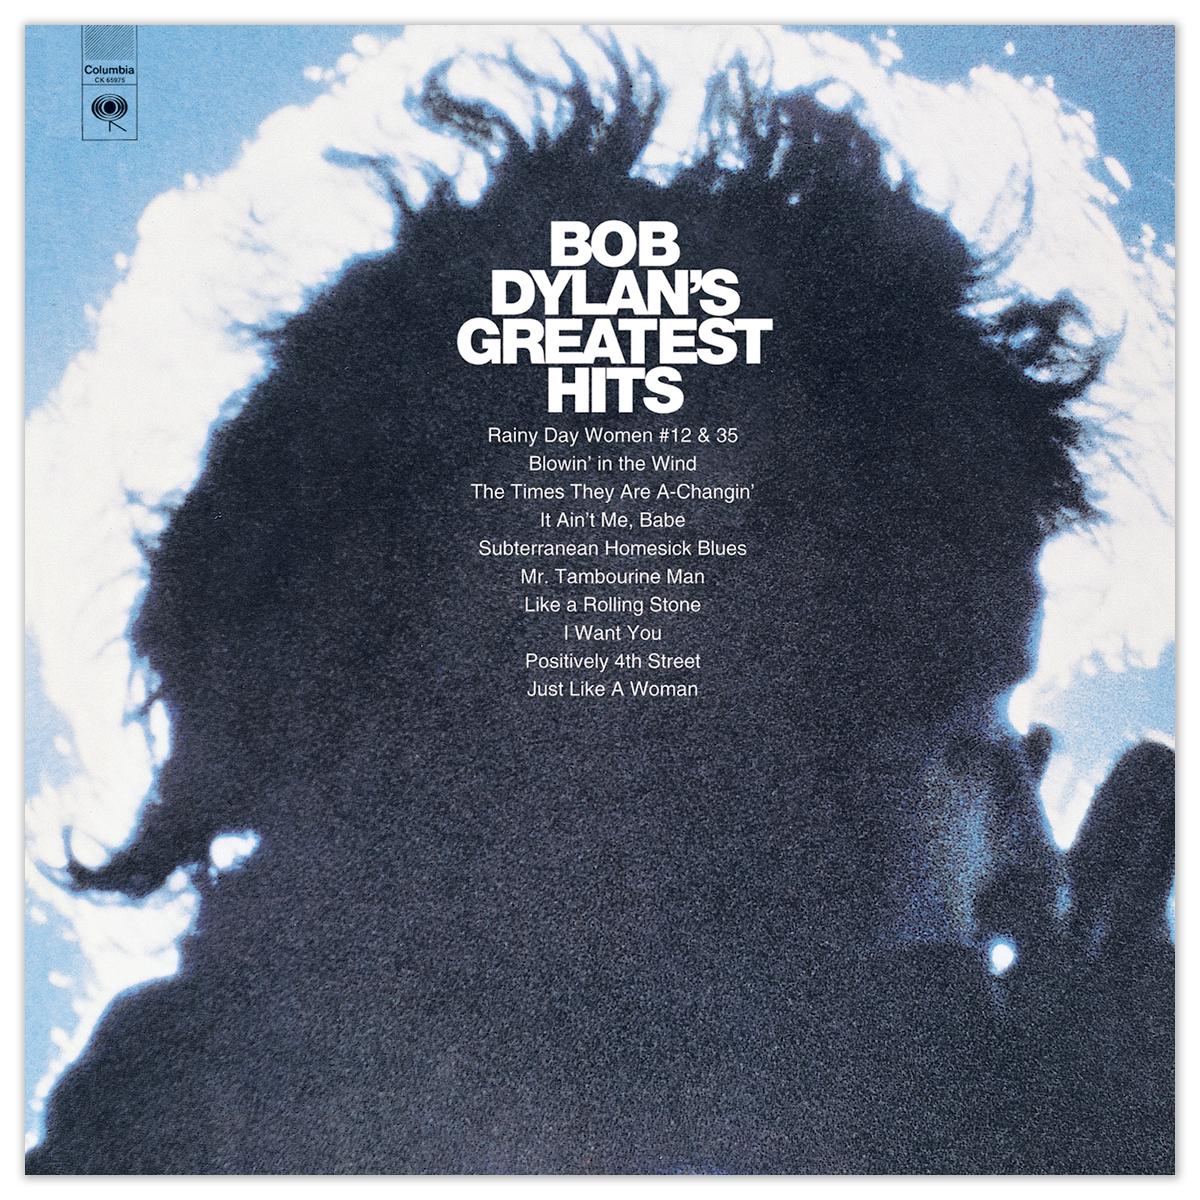 Bob Dylan - Greatest Hits LP